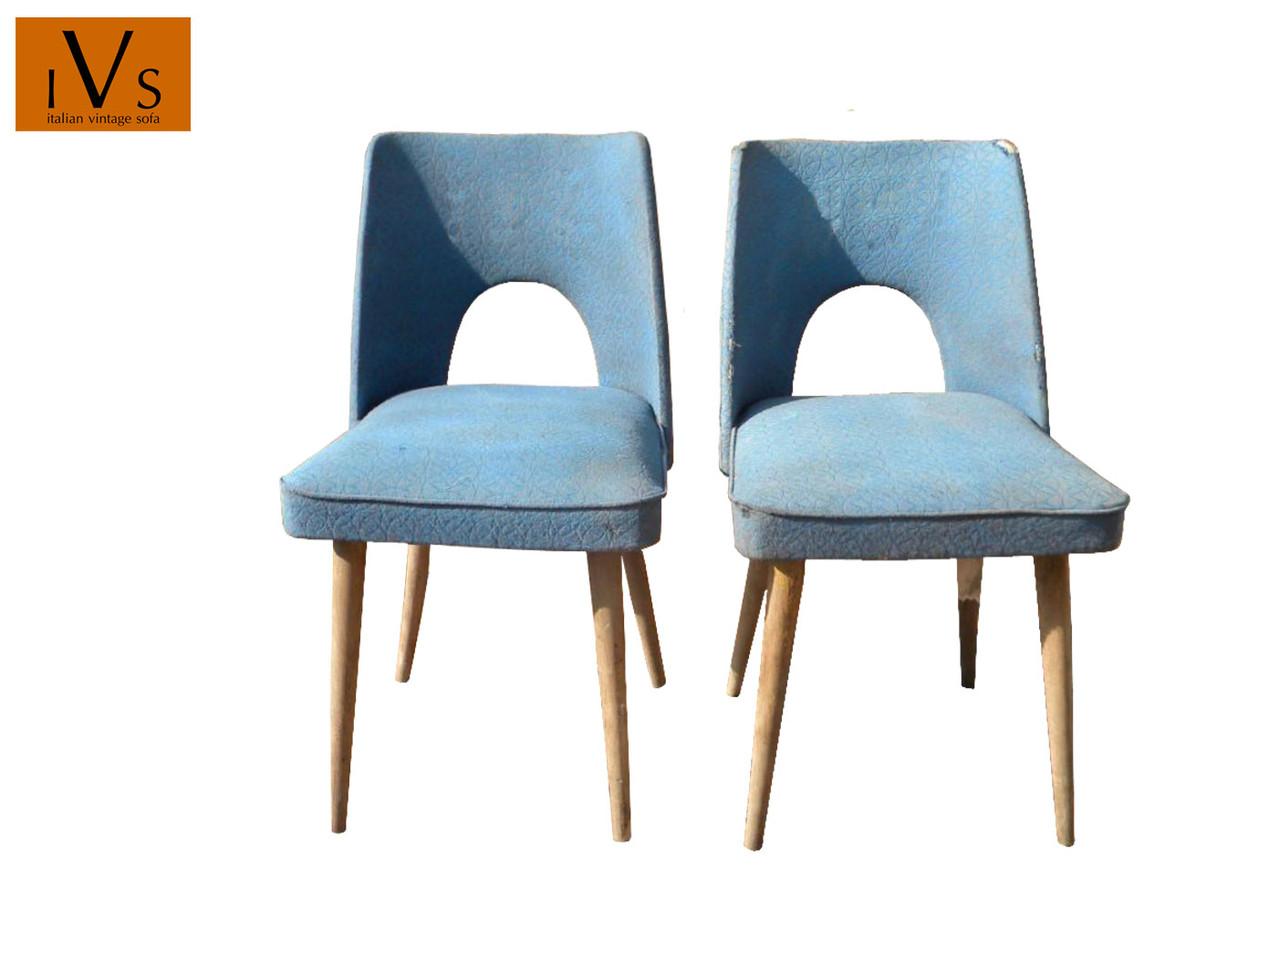 Sedie club chair vintage anni 50 italian vintage sofa - Sedie design anni 50 ...